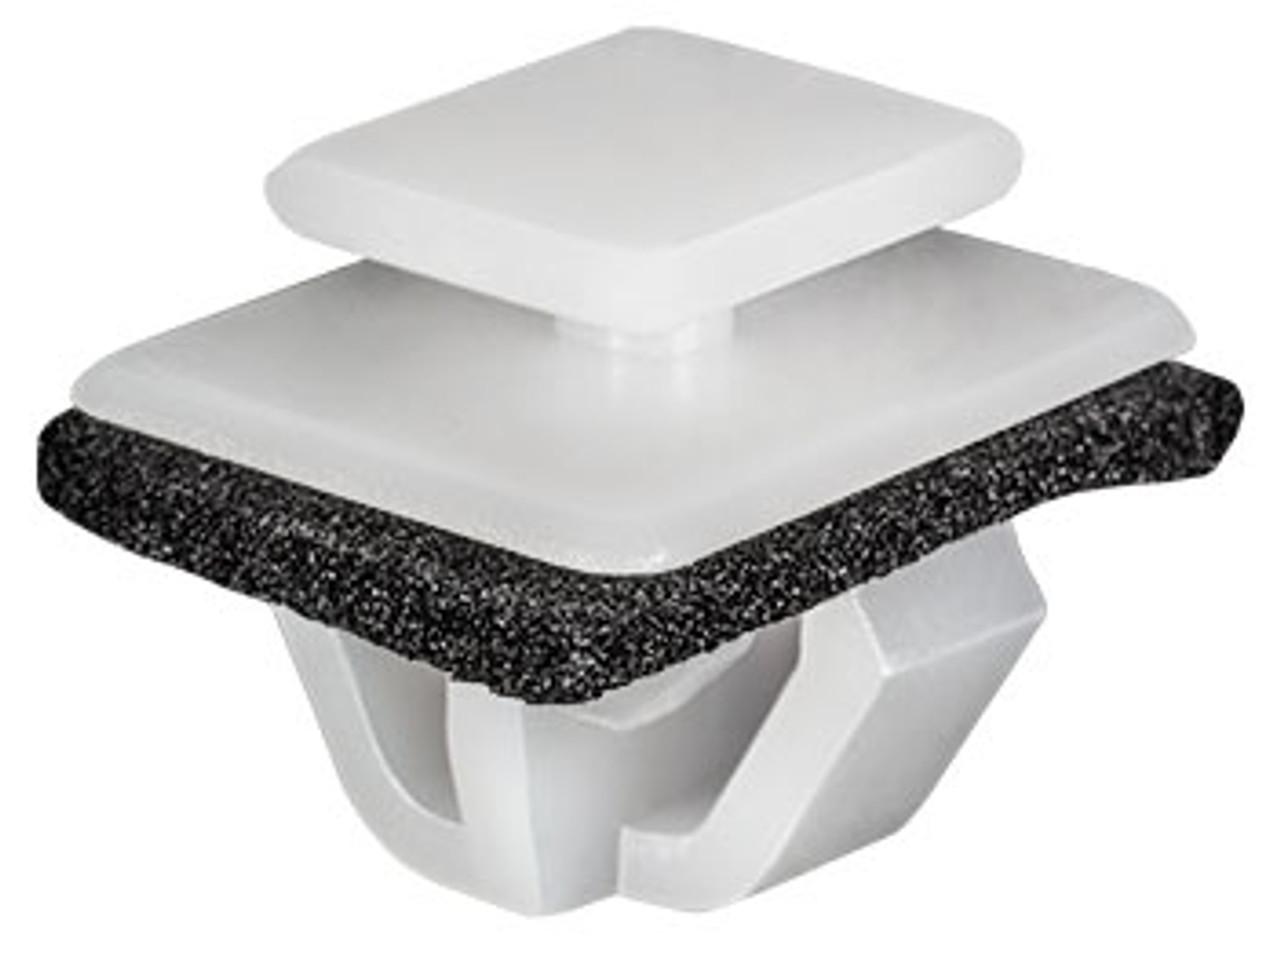 Moulding Clip With Sealer White Nylon Top Head Size: 10mm x 12mm Bottom Head Size: 14mm x 18mm Stem Length: 10mm Hyundai Accent, Kia Soul & Mitsubishi Outlander 2006 - On OEM# 87758-35010 15 Per Box